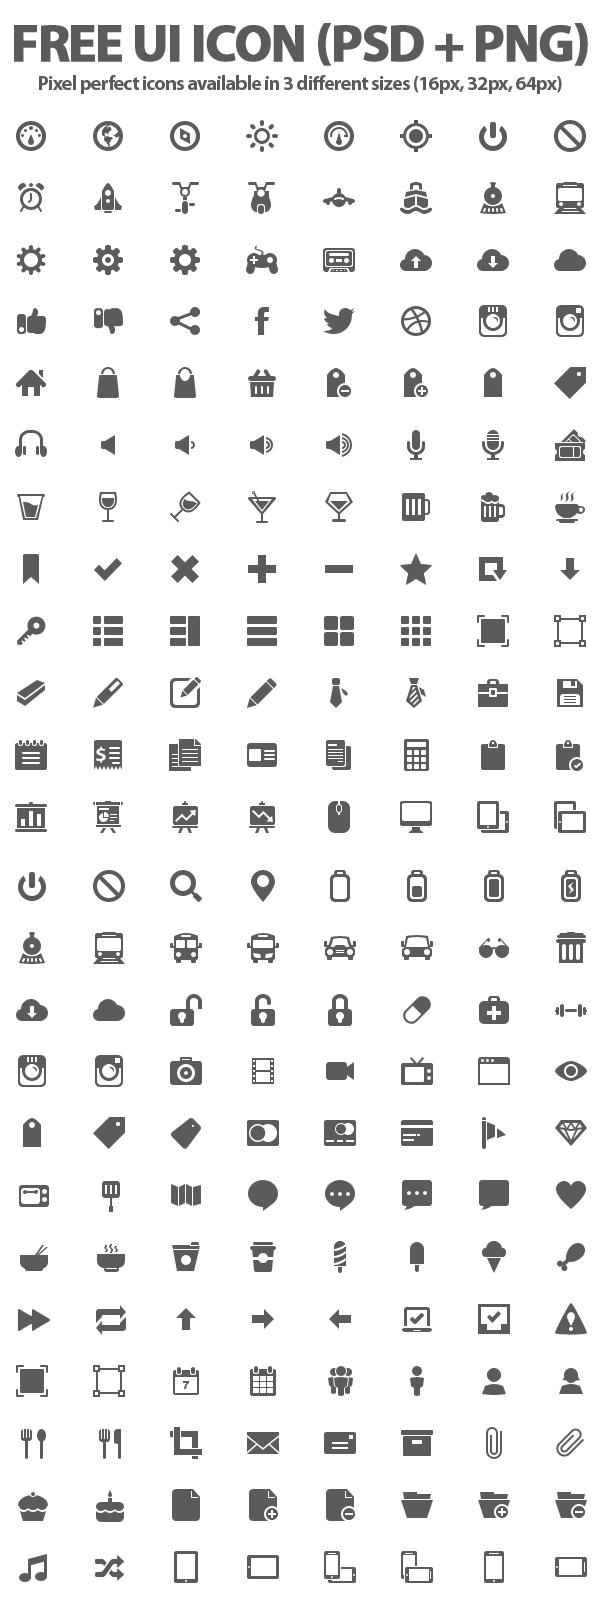 Free UI Icons PSD